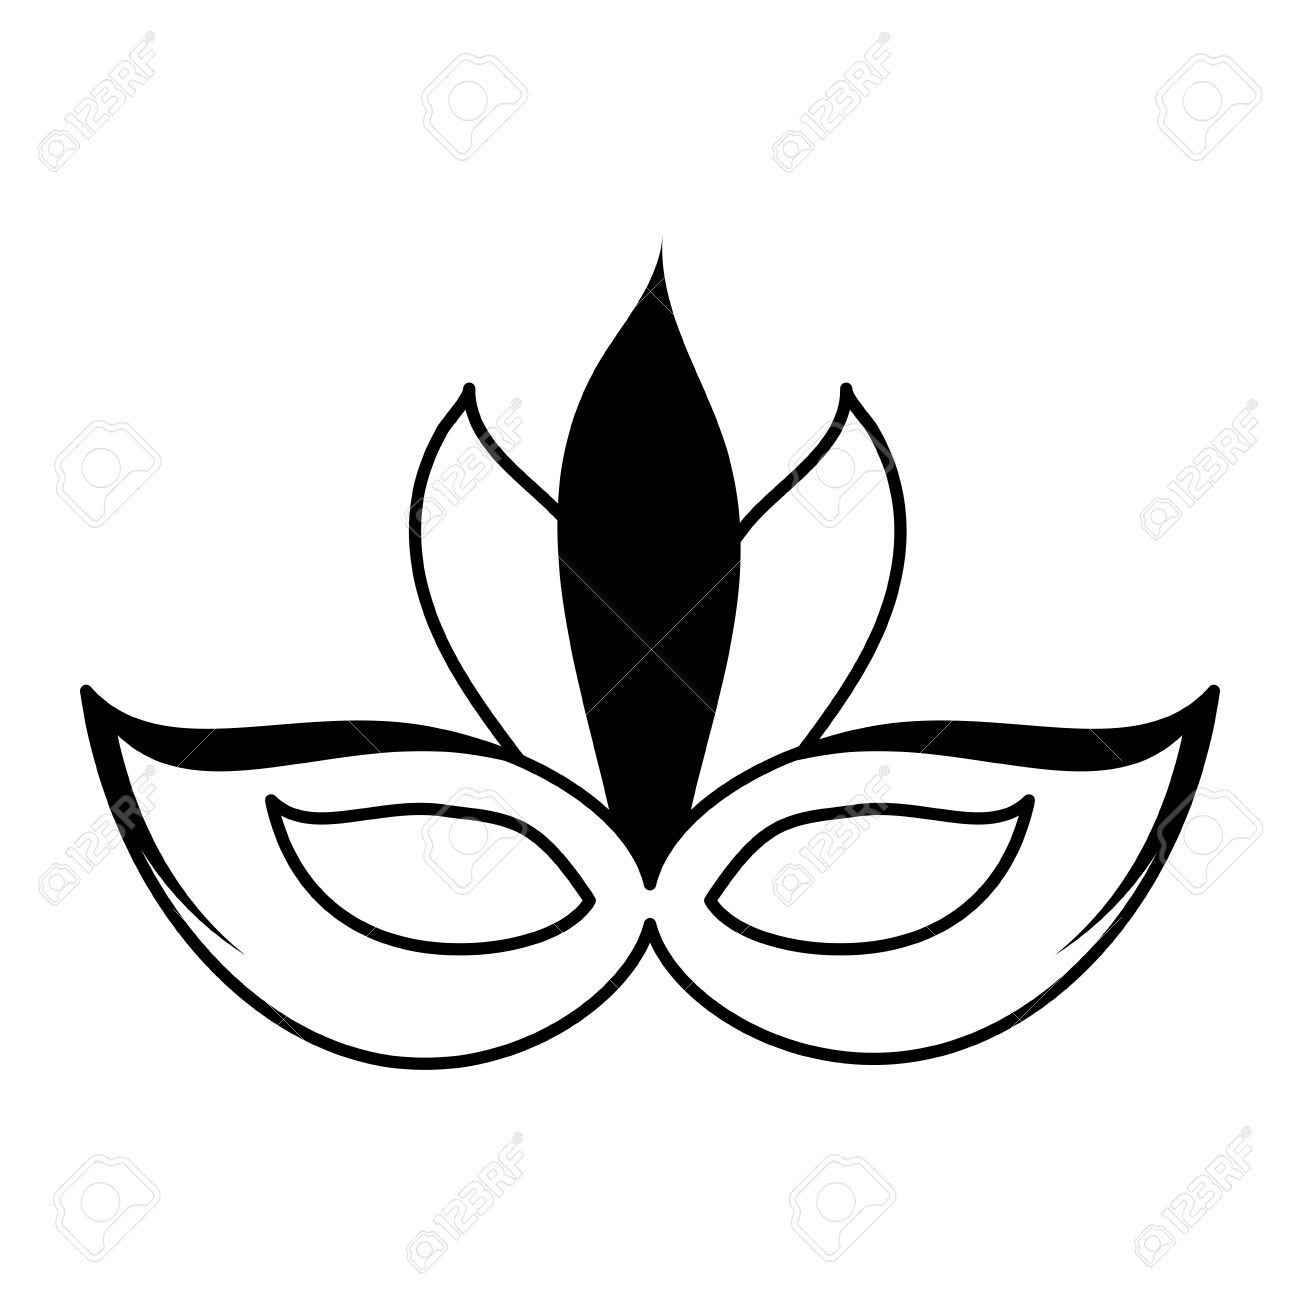 Carnival Mask Icon Image Vector Illustration Design Black And White Stock  Vector   81145572